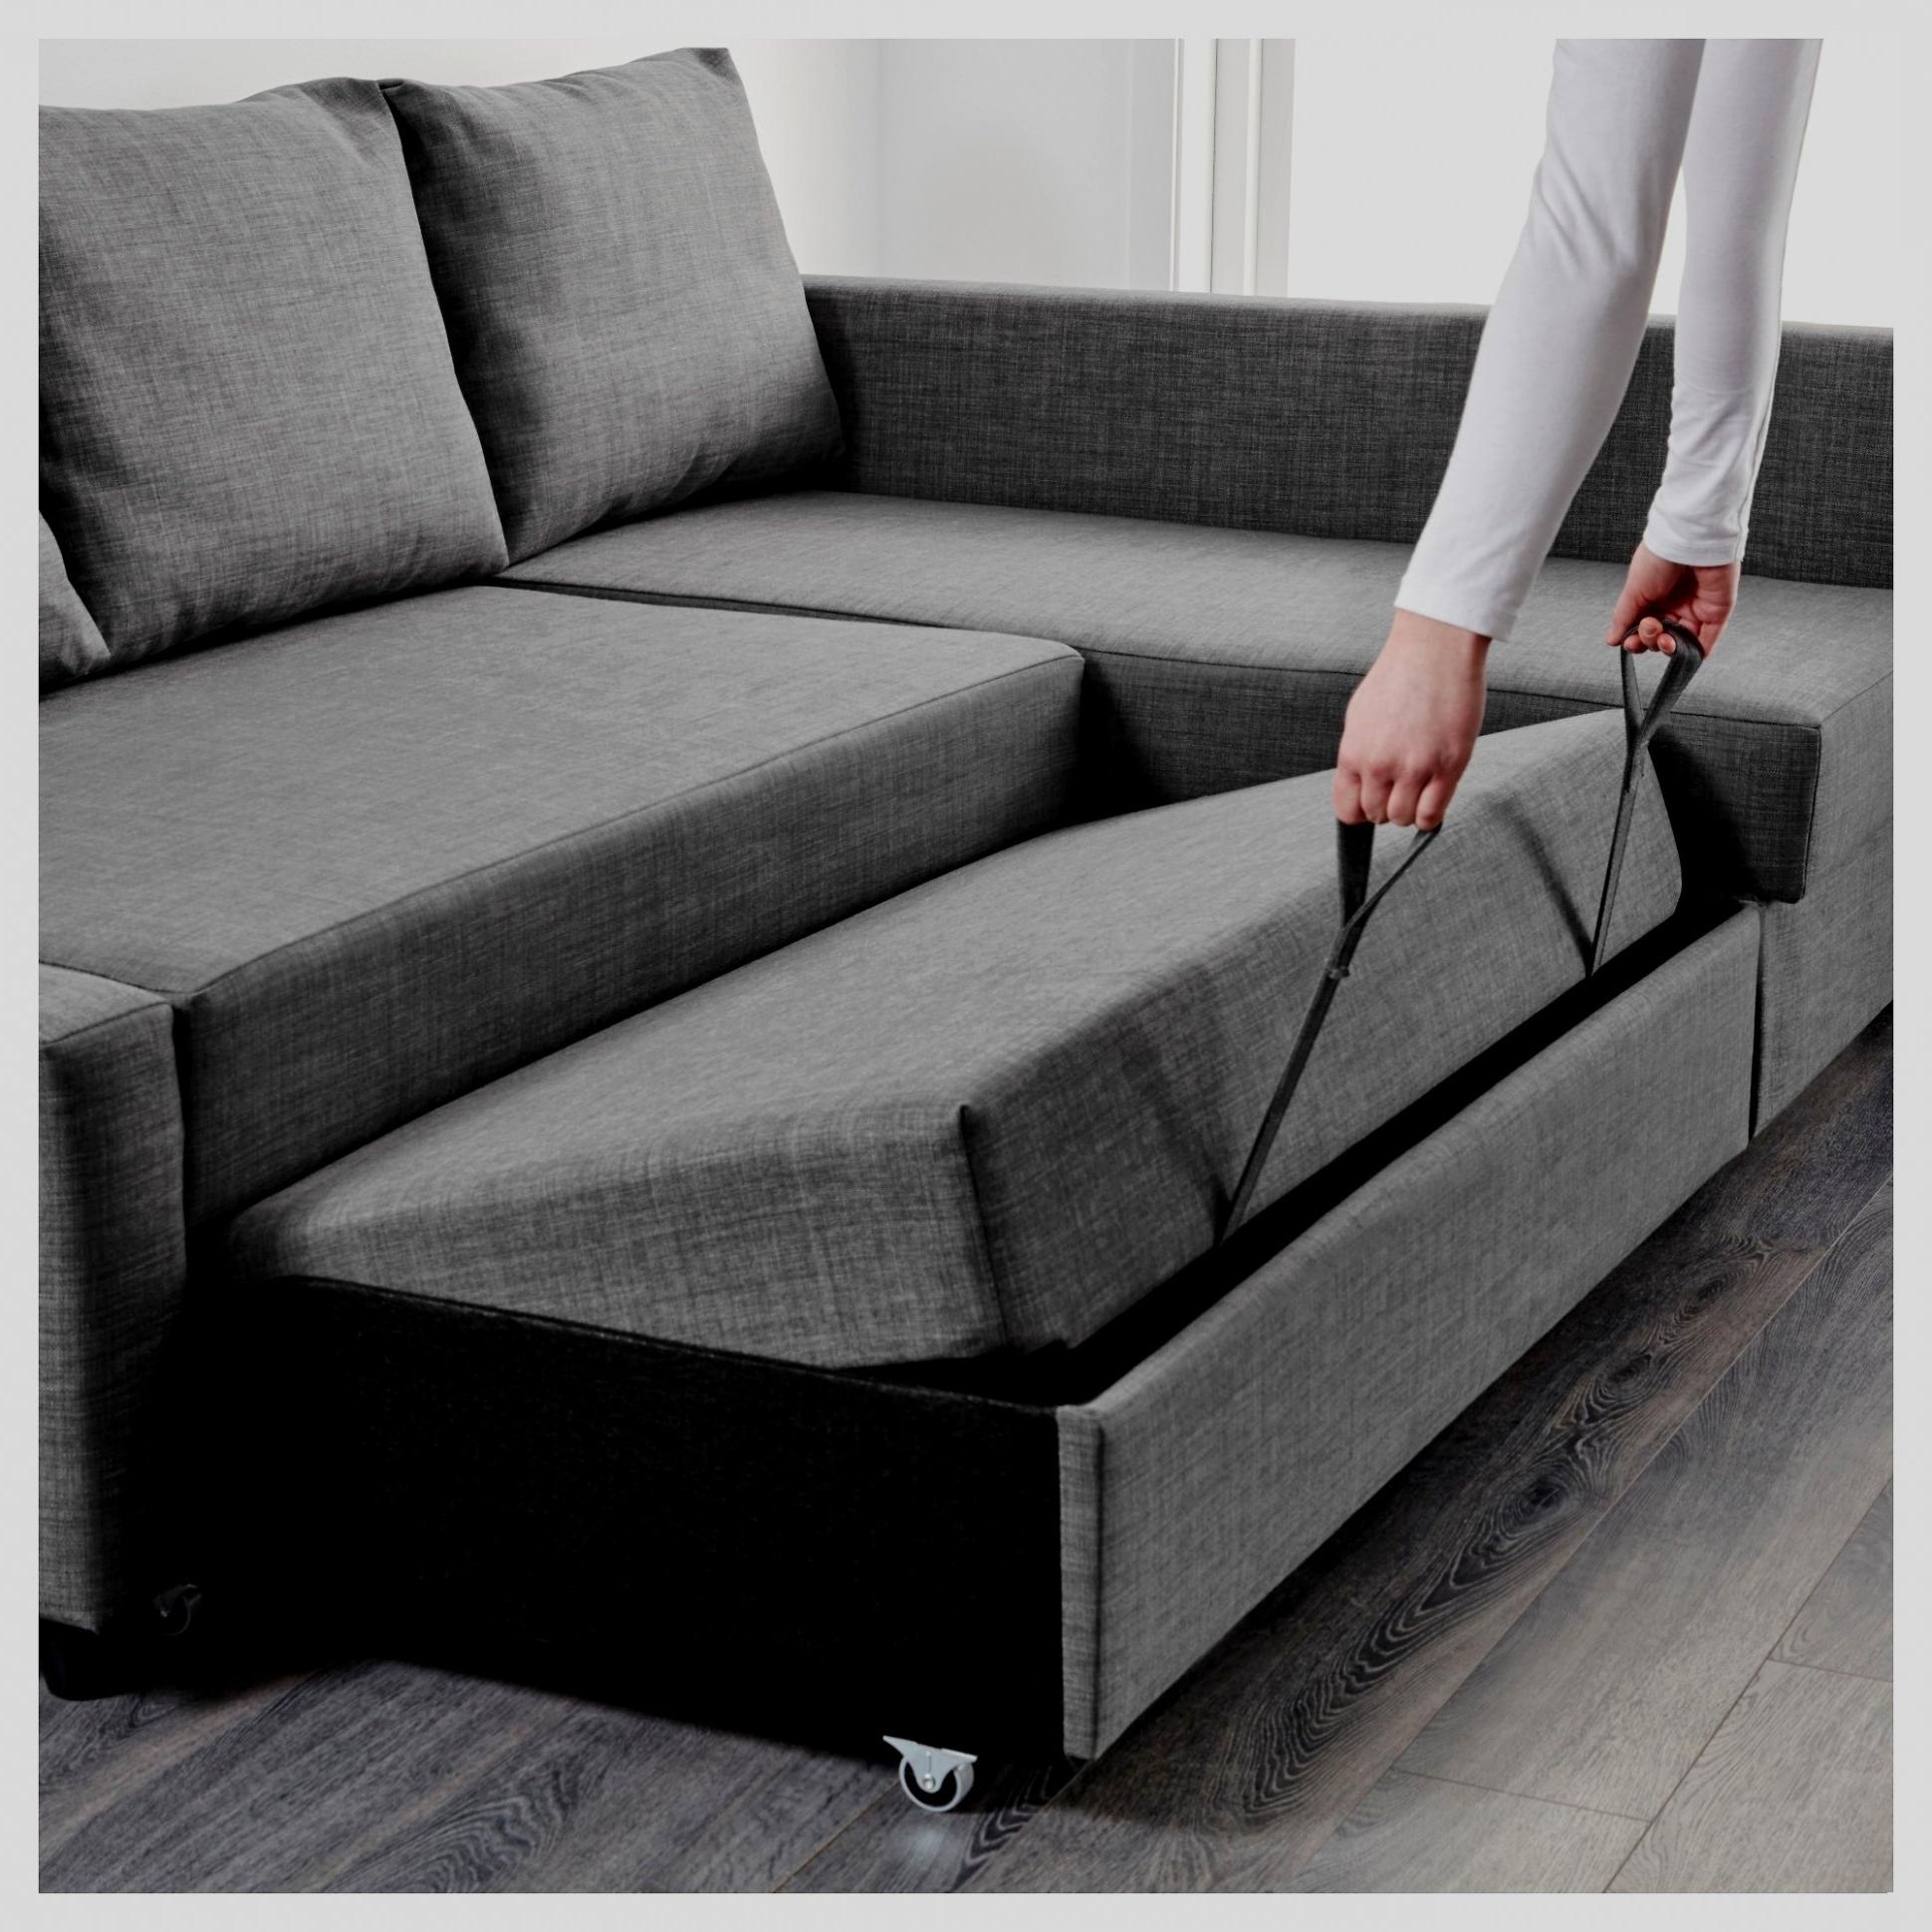 Sillon Relax Ikea Fmdf Sillon Relax Plegable Lindo Cama Plegable Ikea Sandvika 29